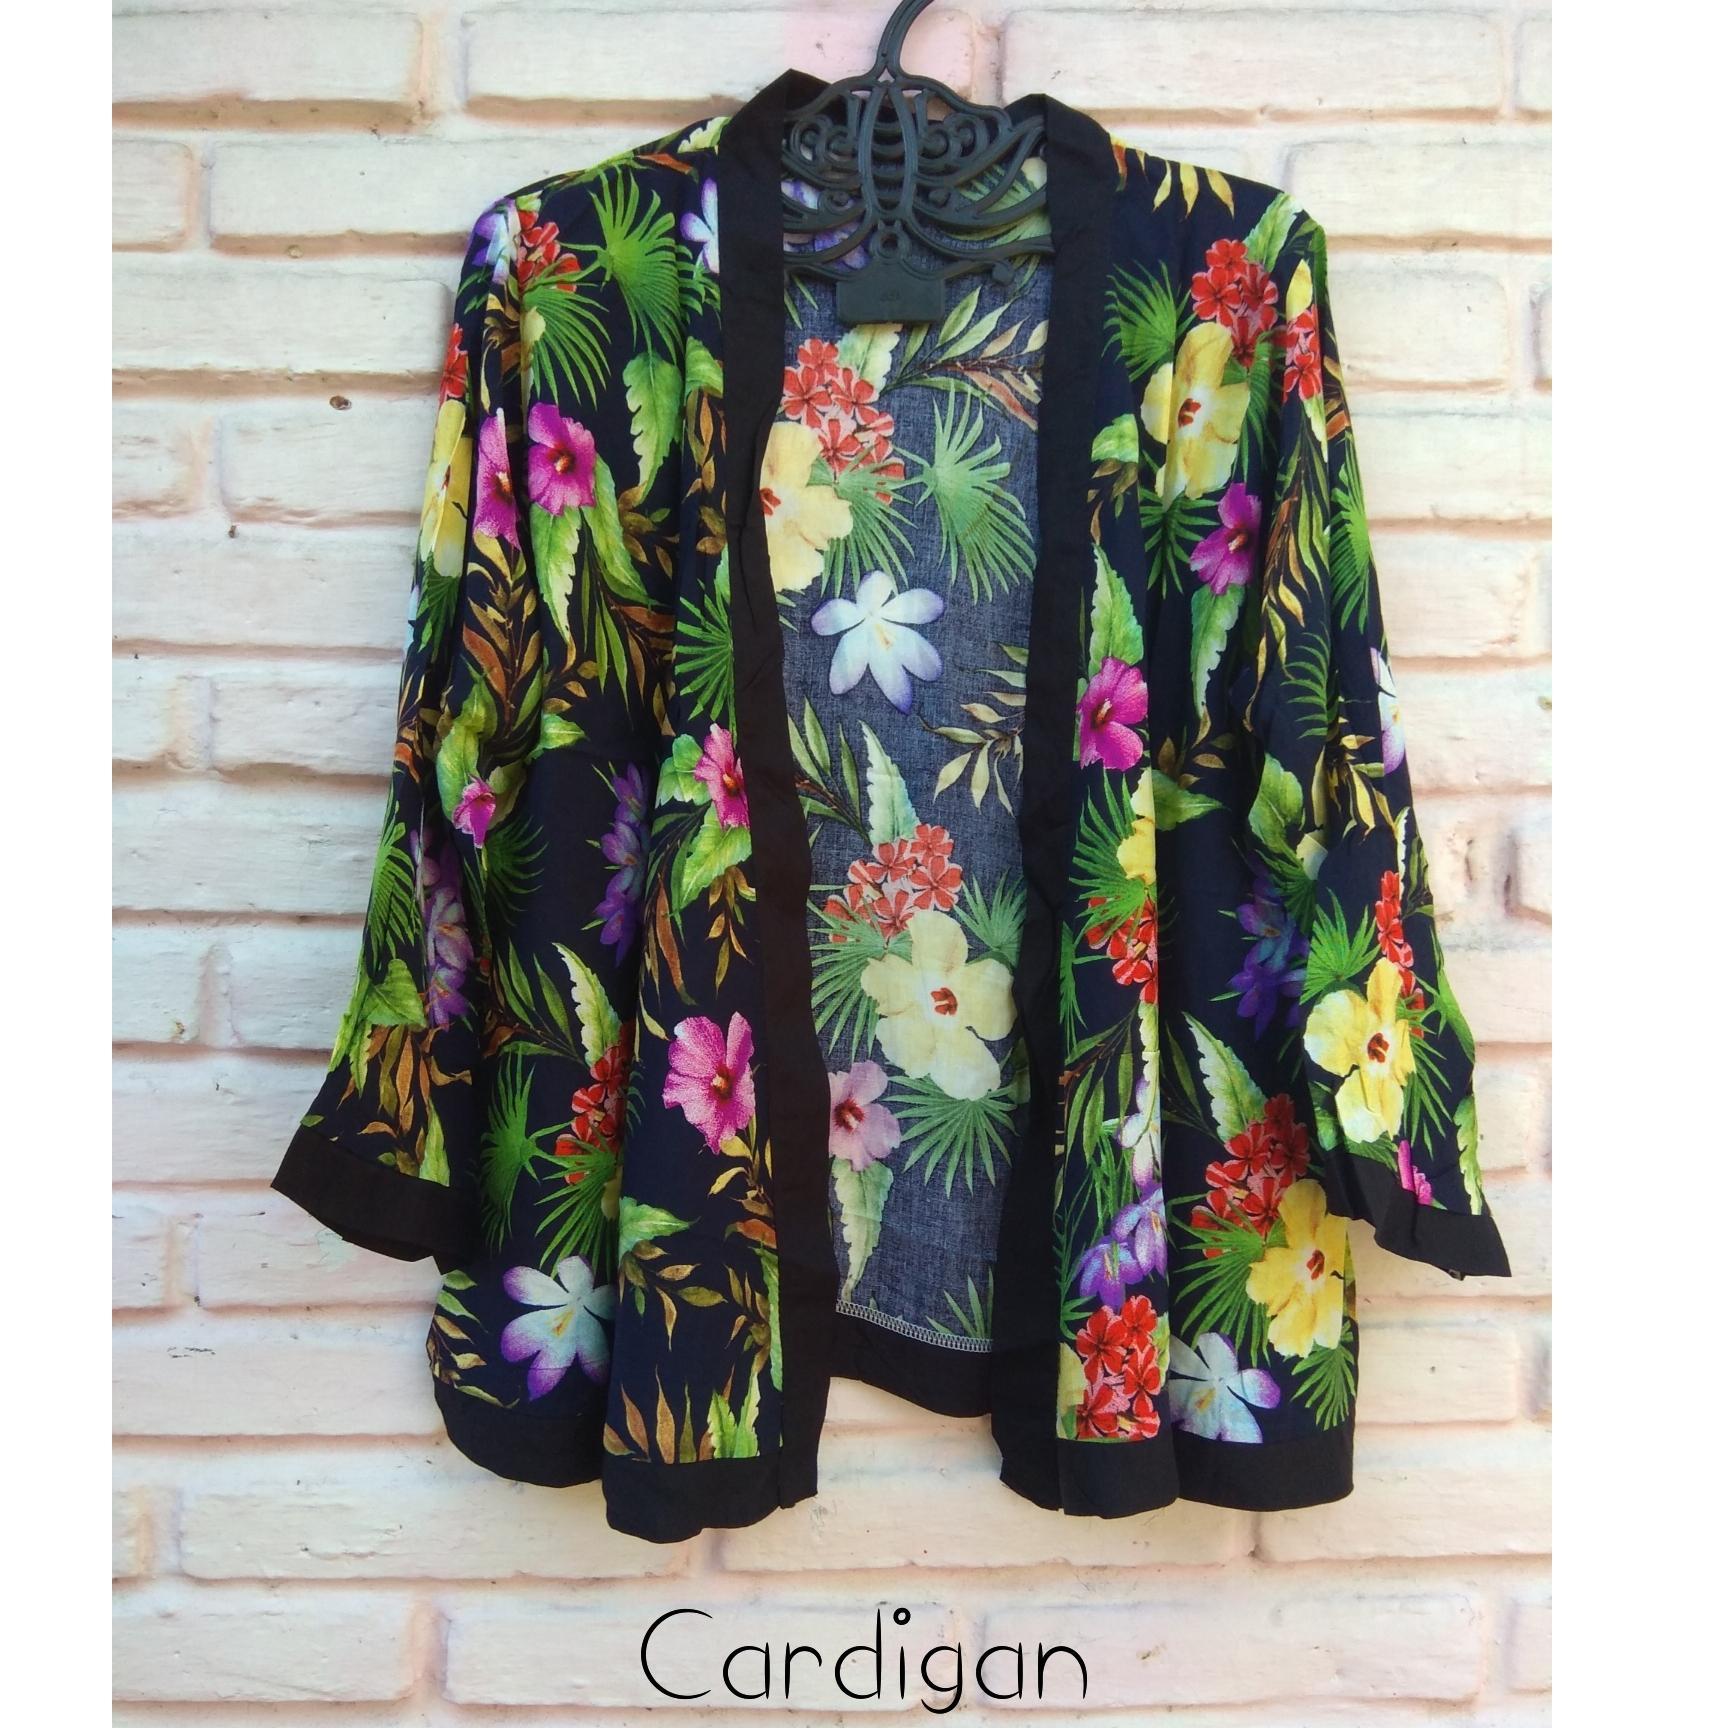 kanaya - cardigan wanita tribal bunga baju bali murah